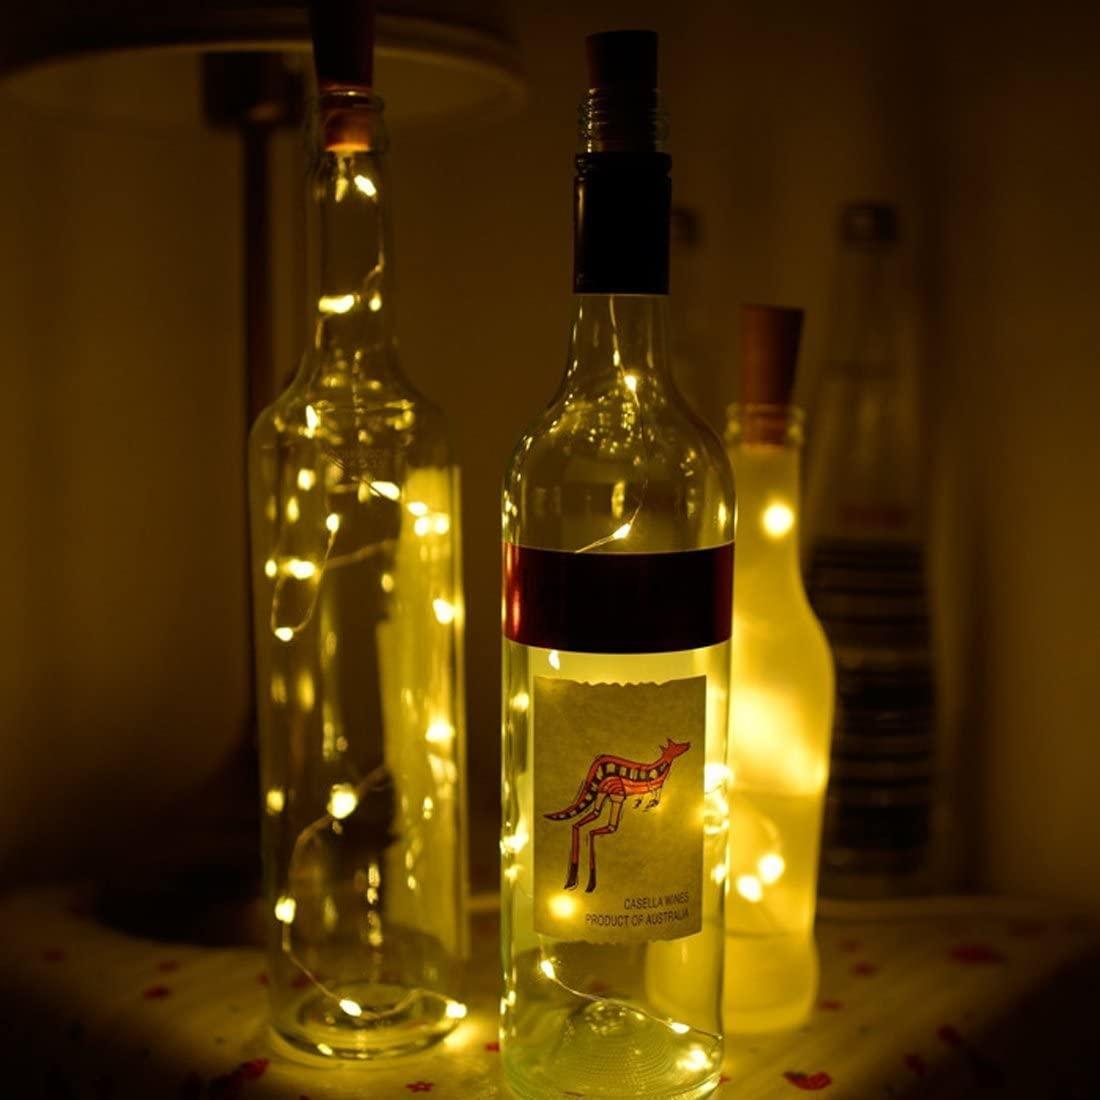 TT-COMMERCE Wine Bottle Lights with Cork,LED Cork Lights for Bottle,Copper Wire Bottle Lights for DIY, Party, Decor, Christmas, Halloween,Wedding(Warm White)